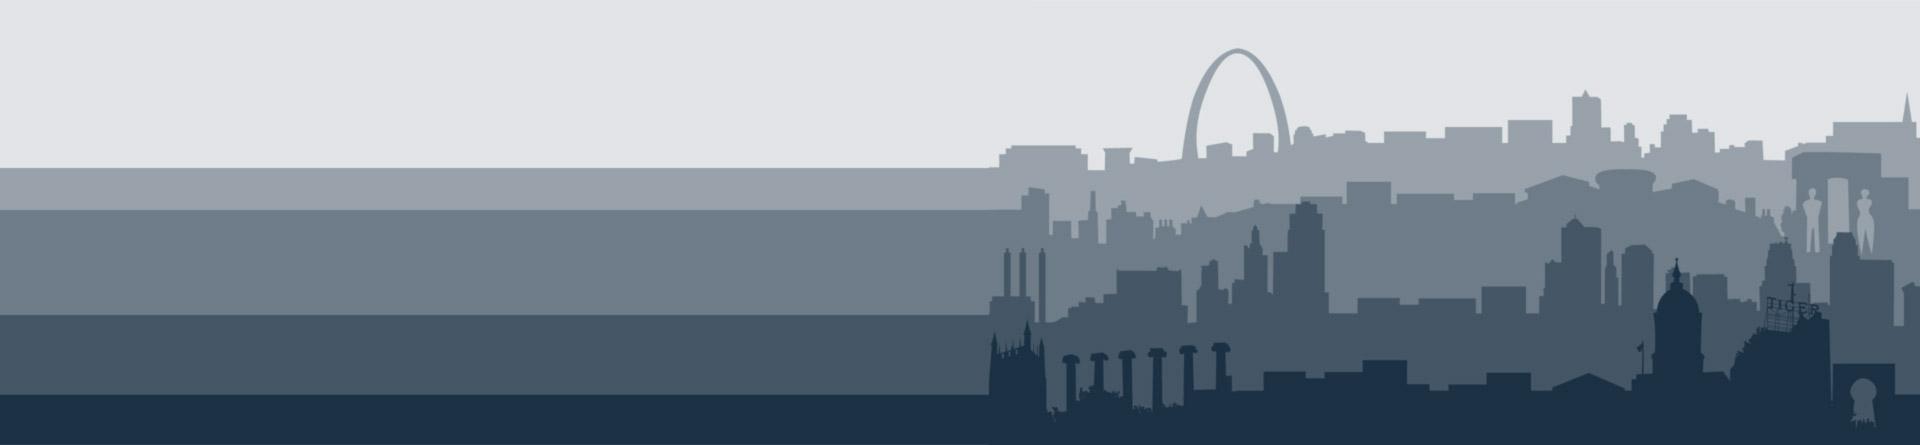 University system illustration